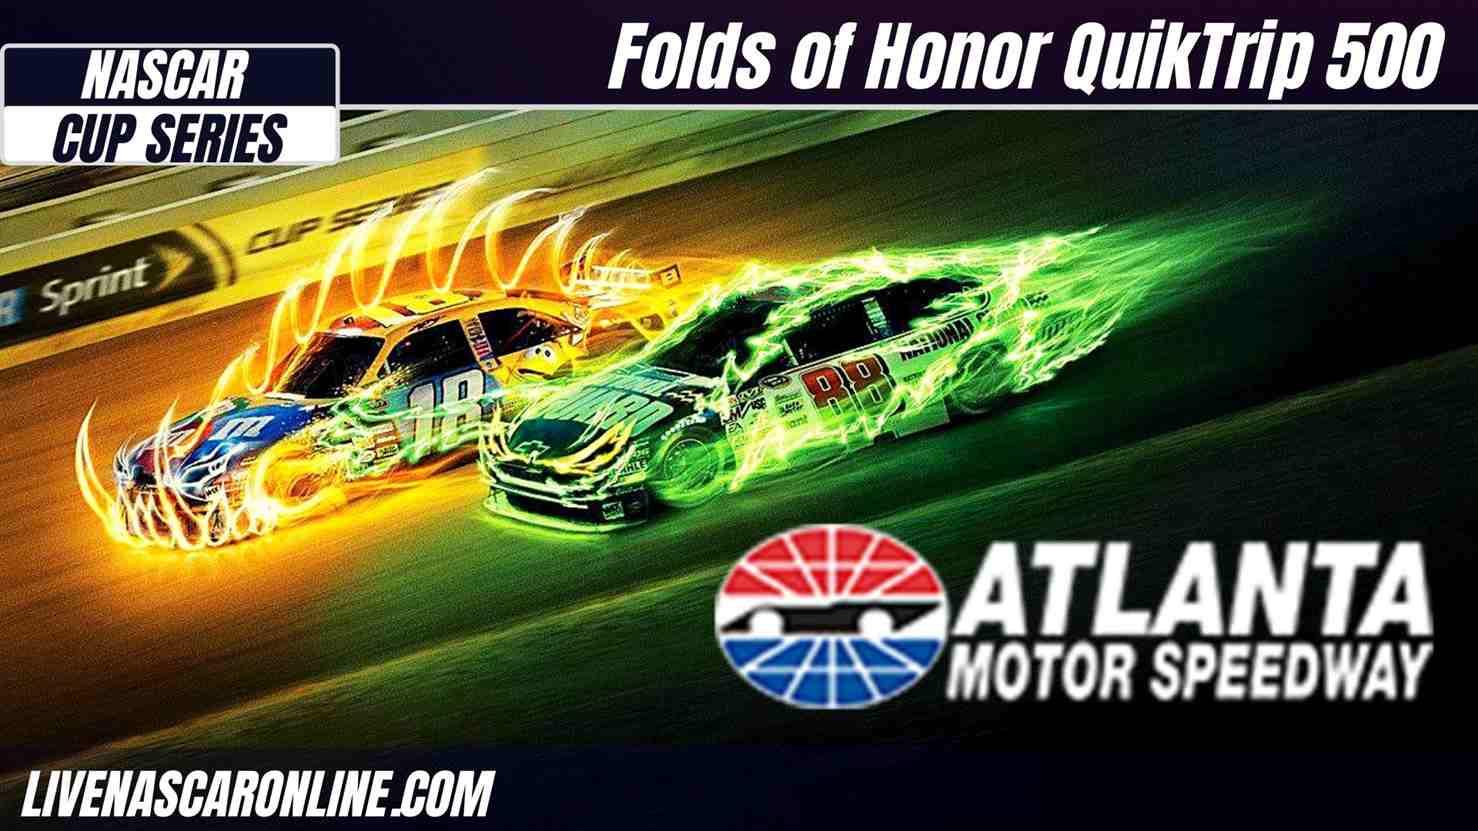 Folds of Honor QuikTrip 500 at Atlanta Live Stream 2021